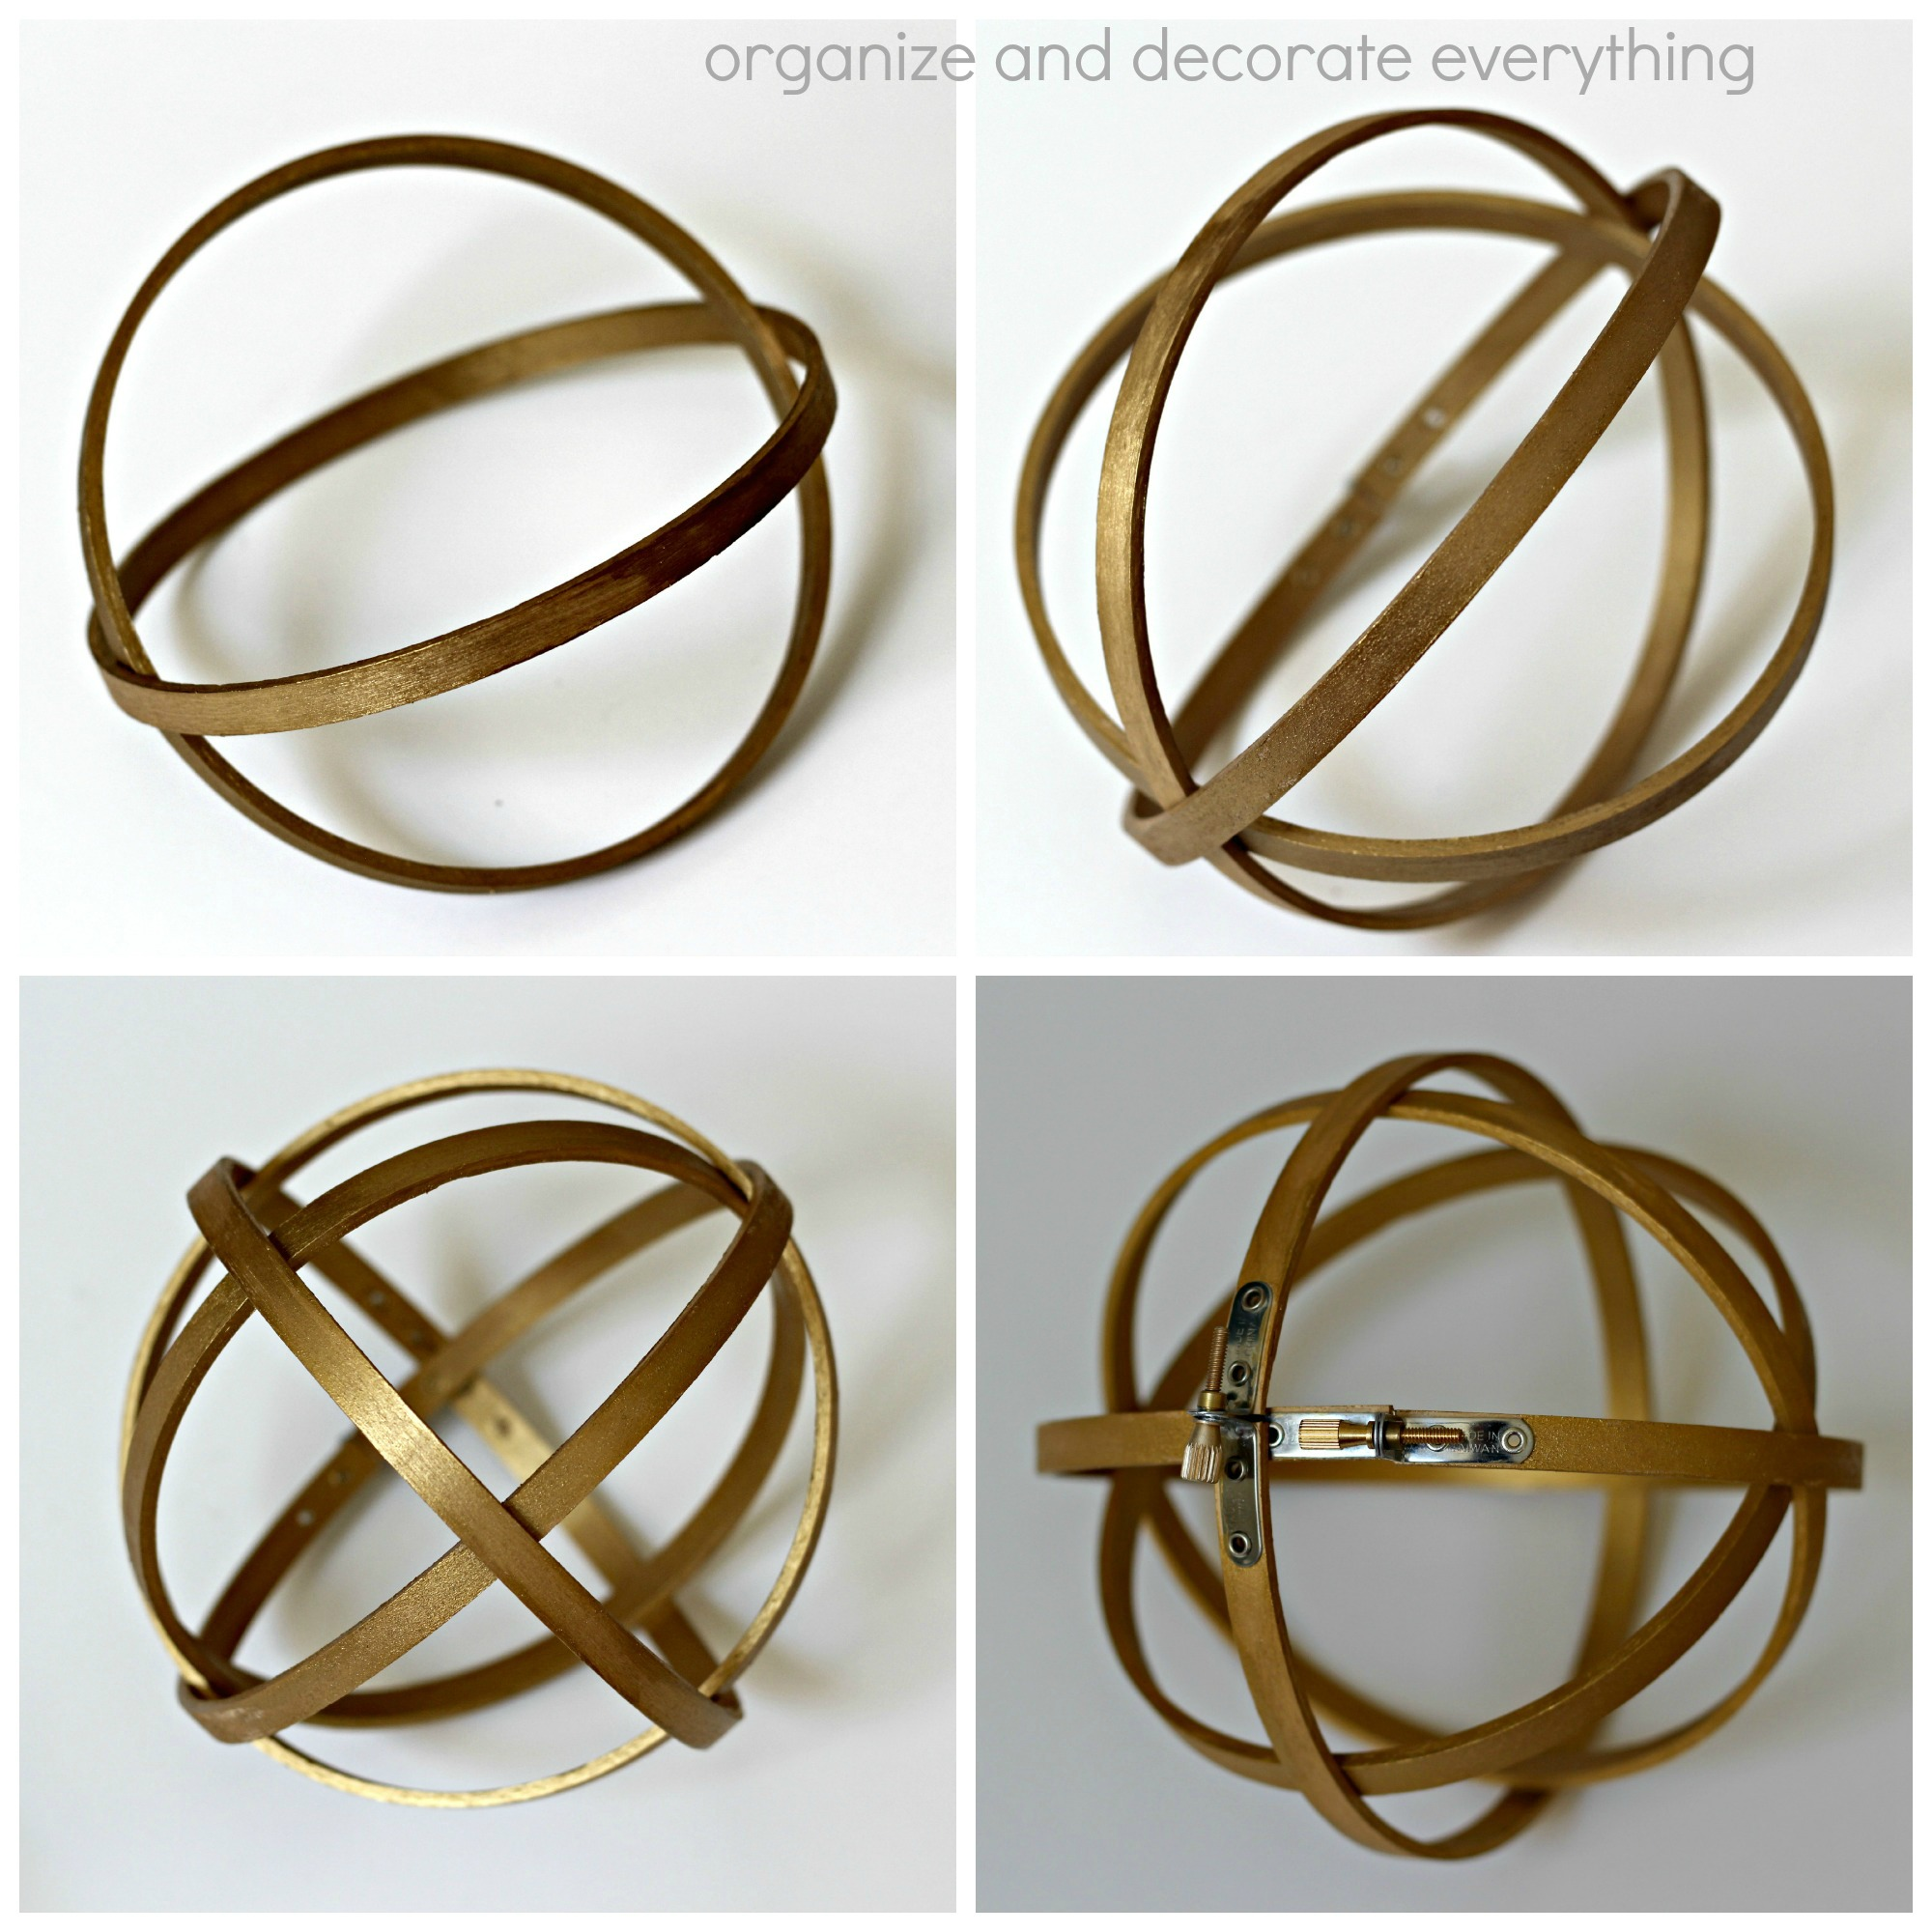 Decorative Wood Sphere collage